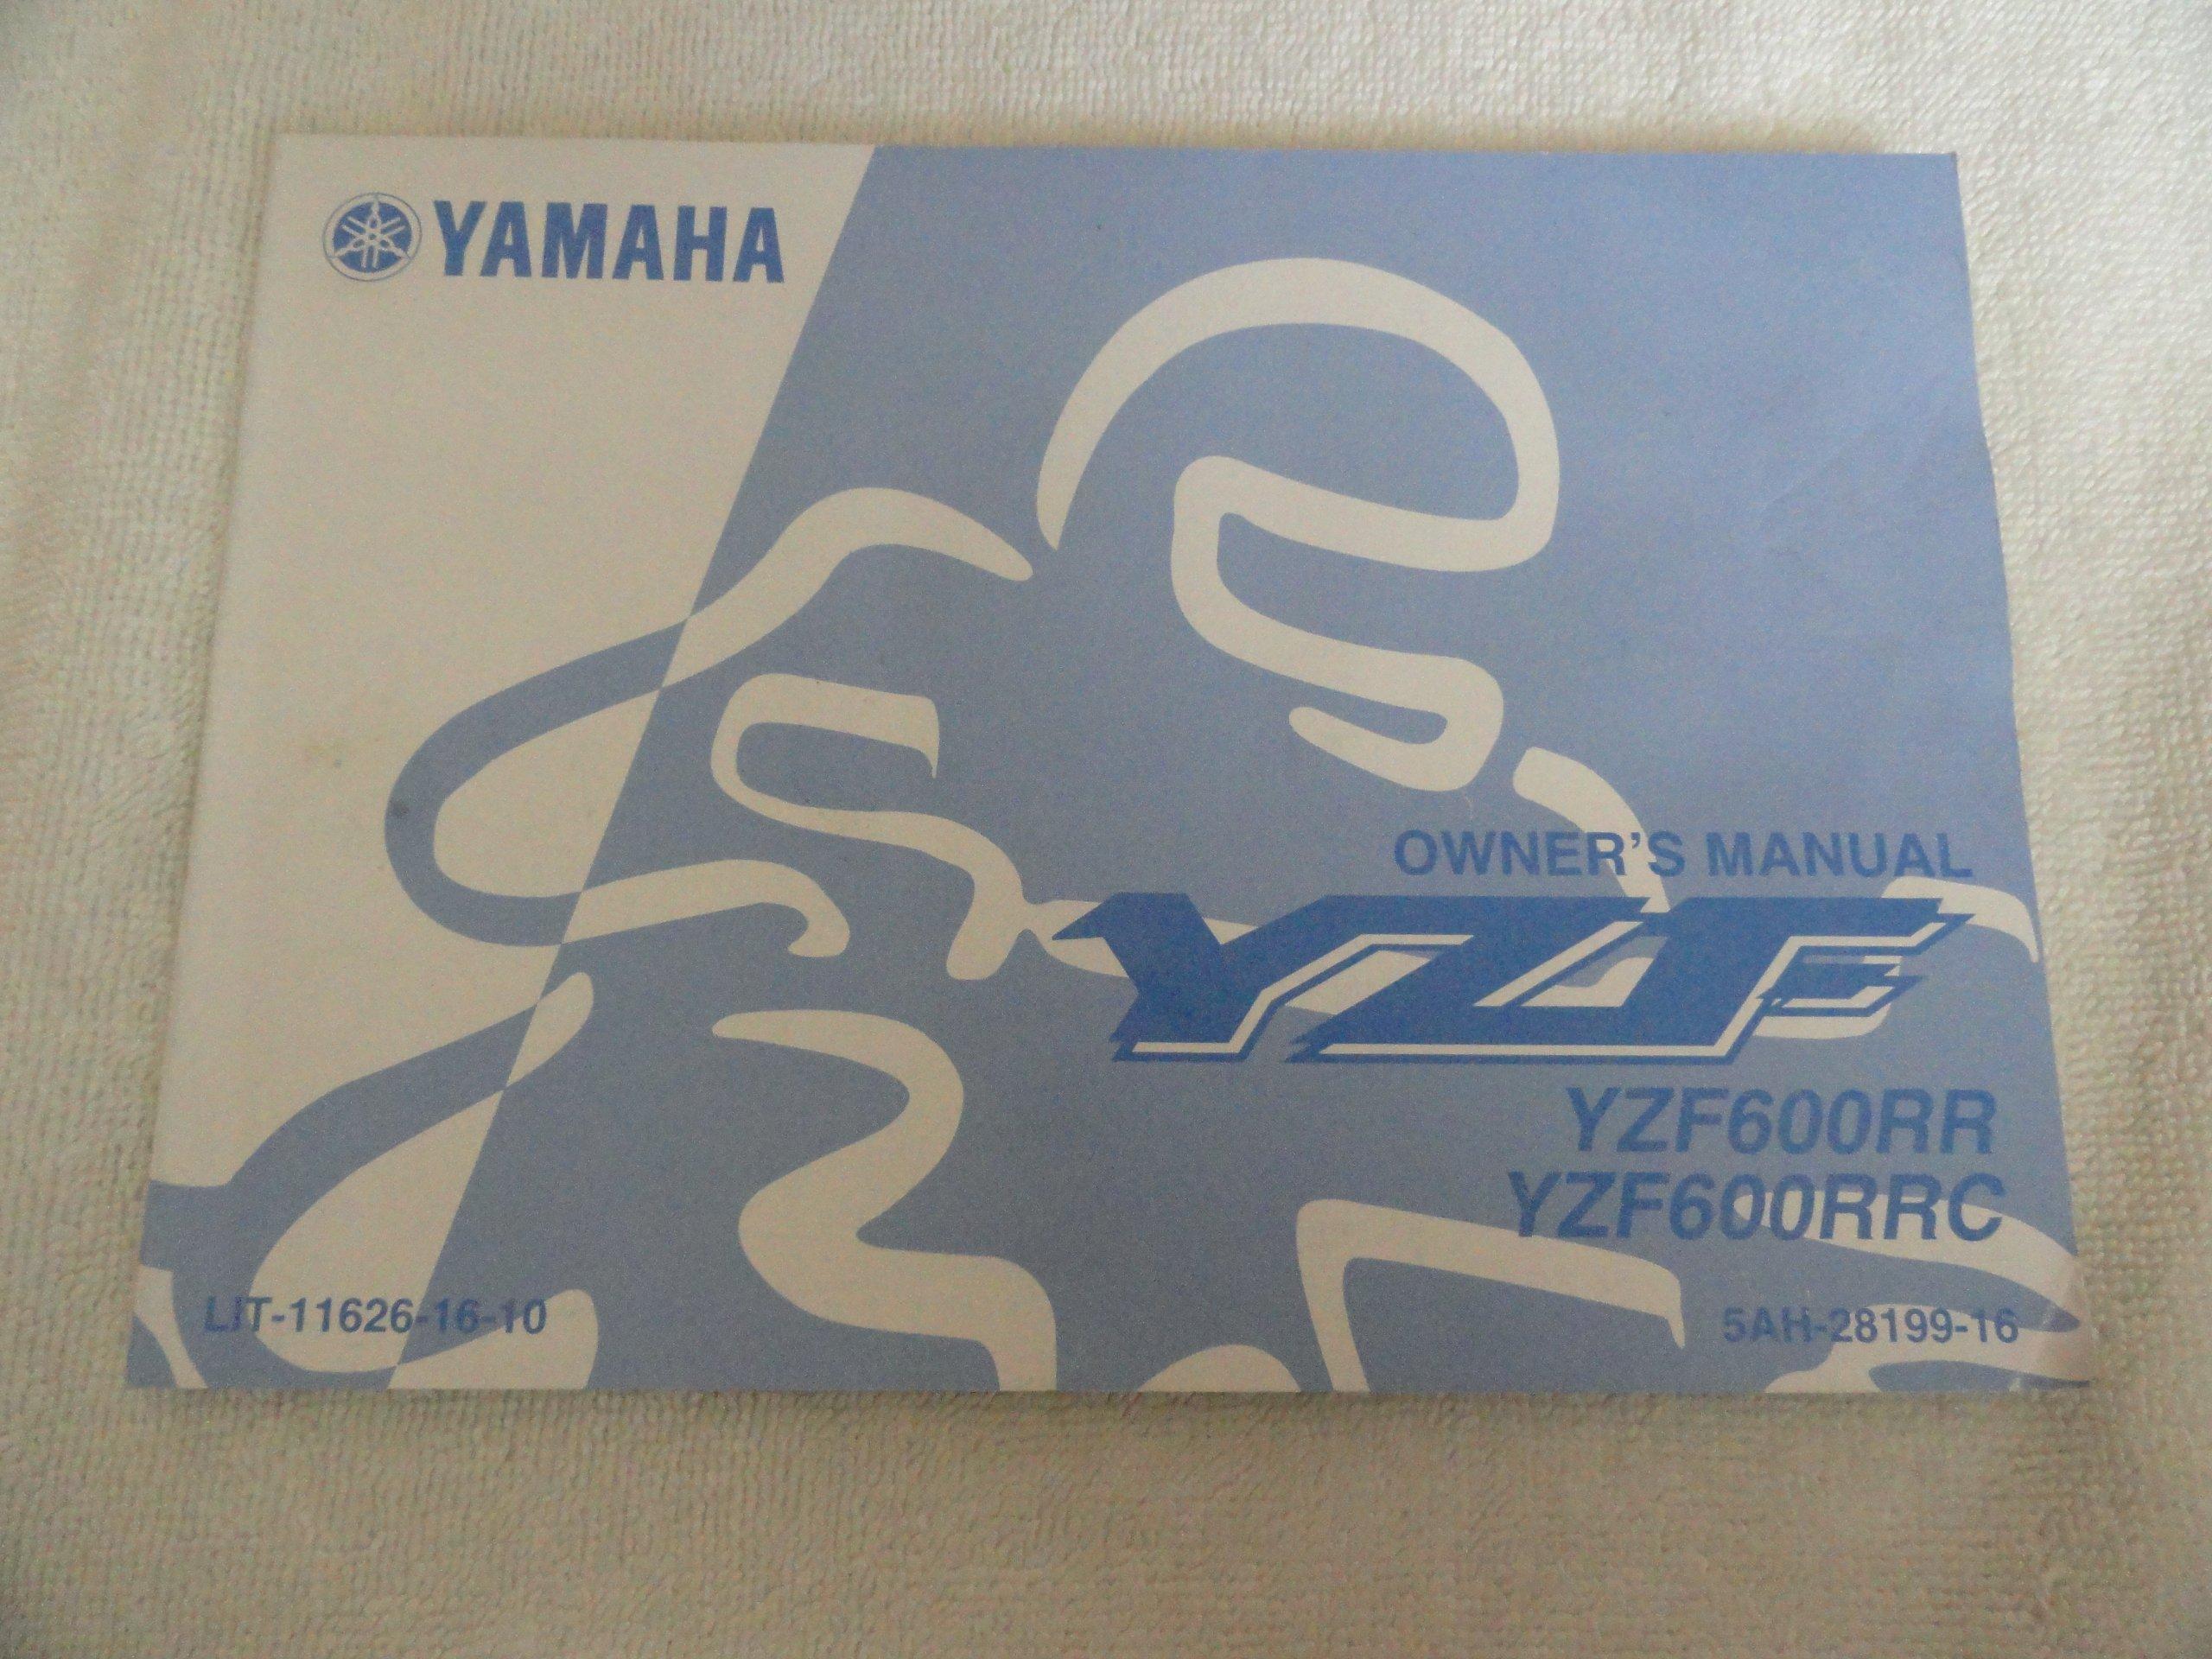 2002 2003 Yamaha YZF600 Owners Manual YZF 600 RR & RRC: Yamaha: Amazon.com:  Books